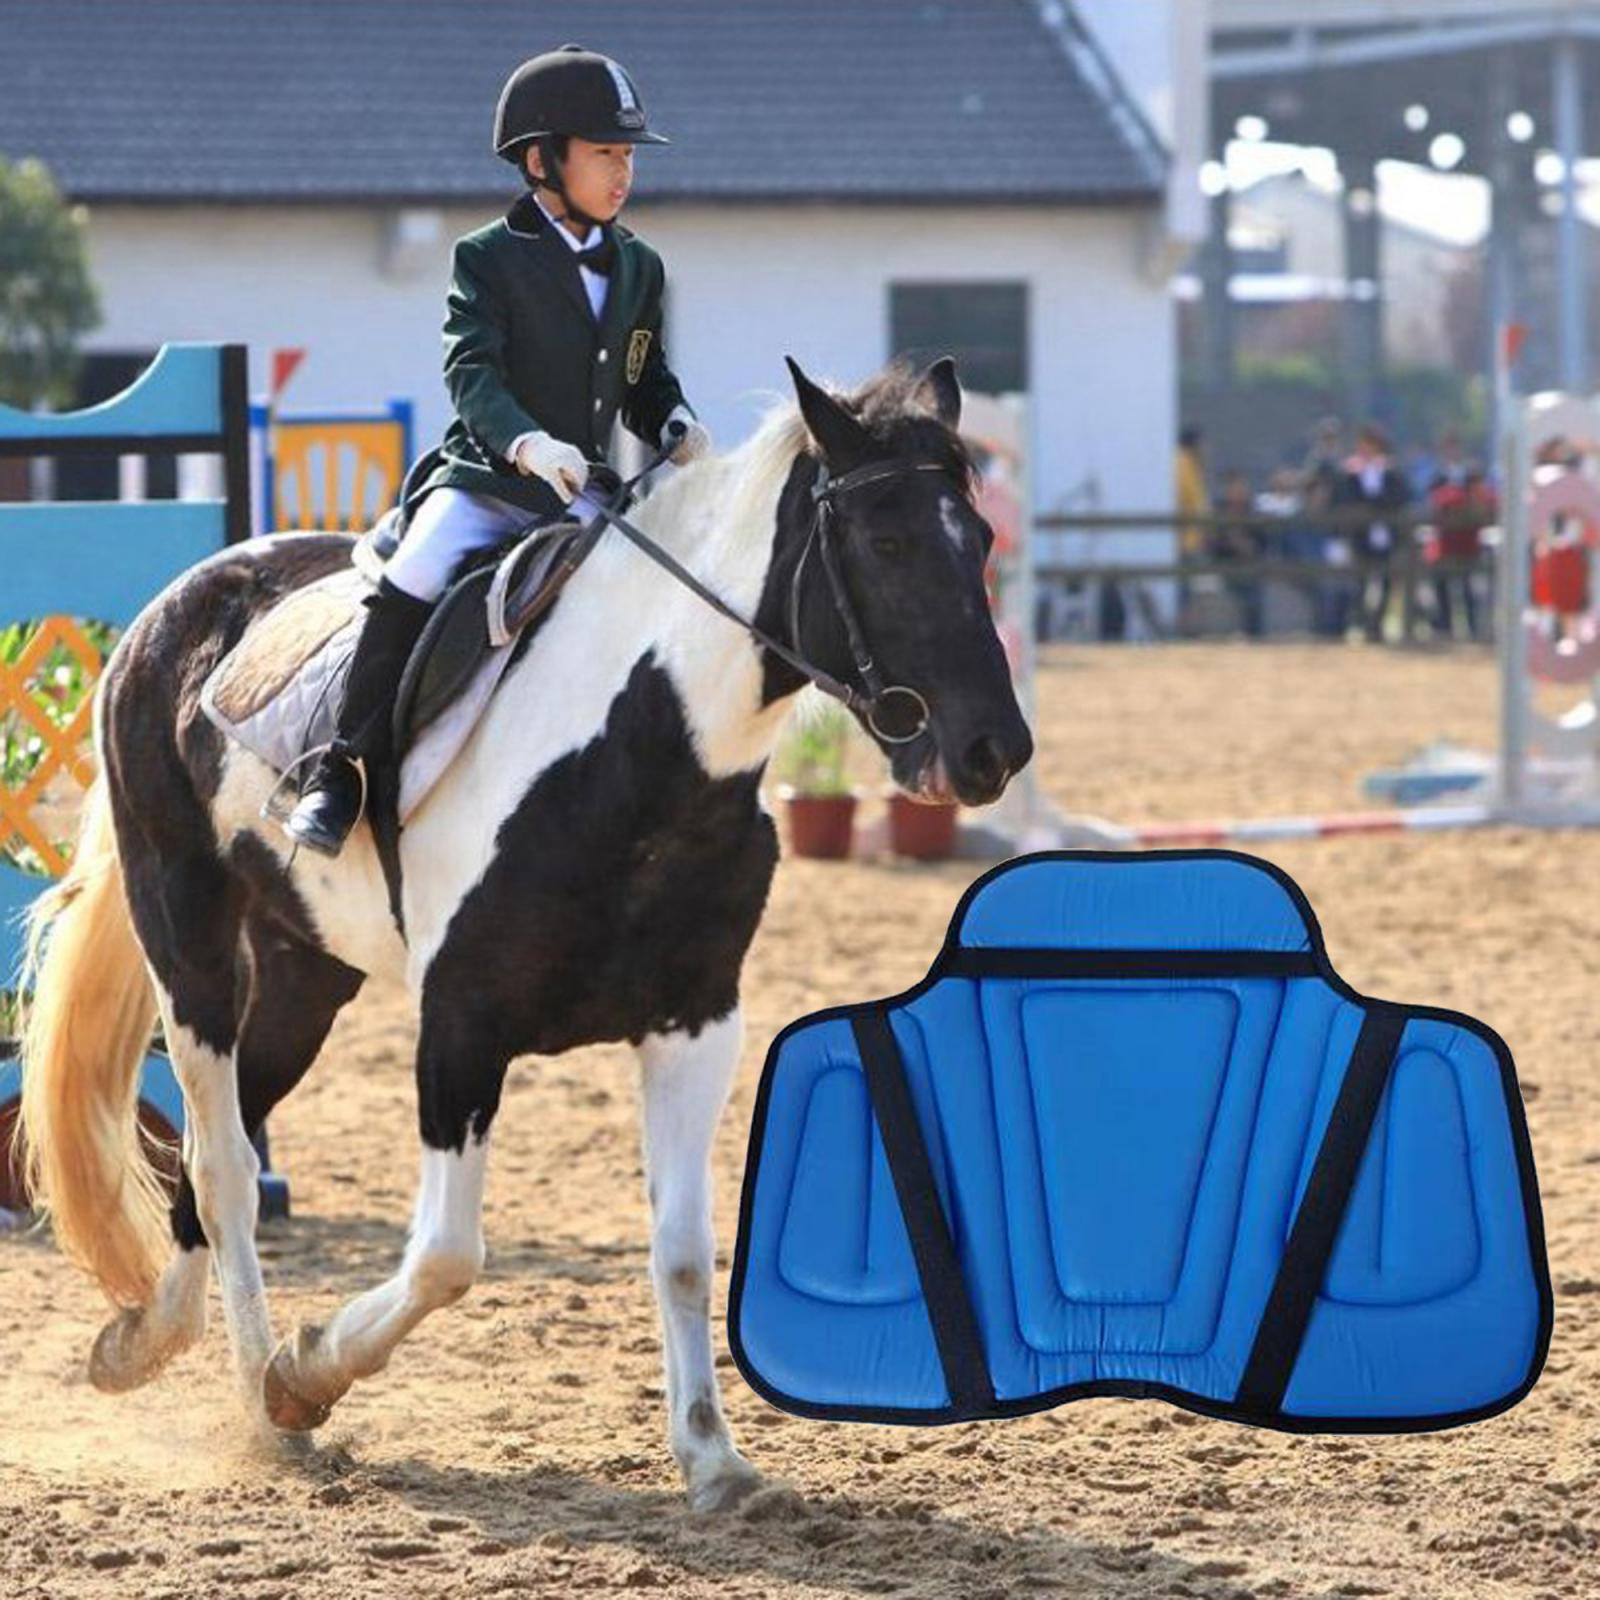 Horse Saddle Pad PU Outdoor Training Seat Cushion Horse Harness Seat Saddle Cushion Leather Pads Equipment Accessories